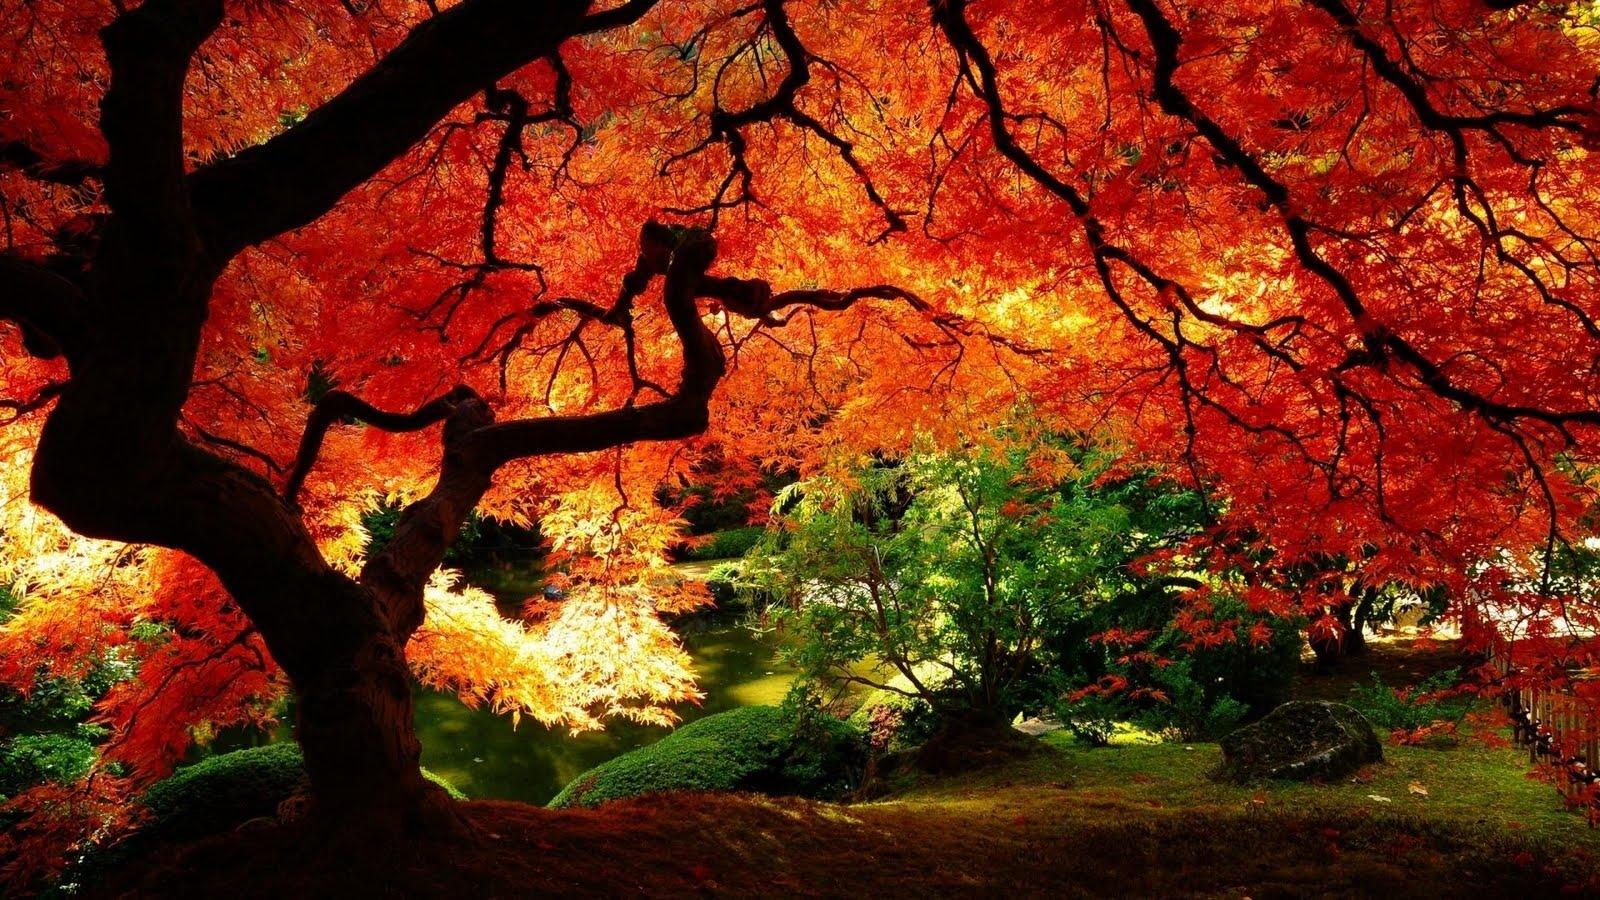 Wallpaper Hd Tree